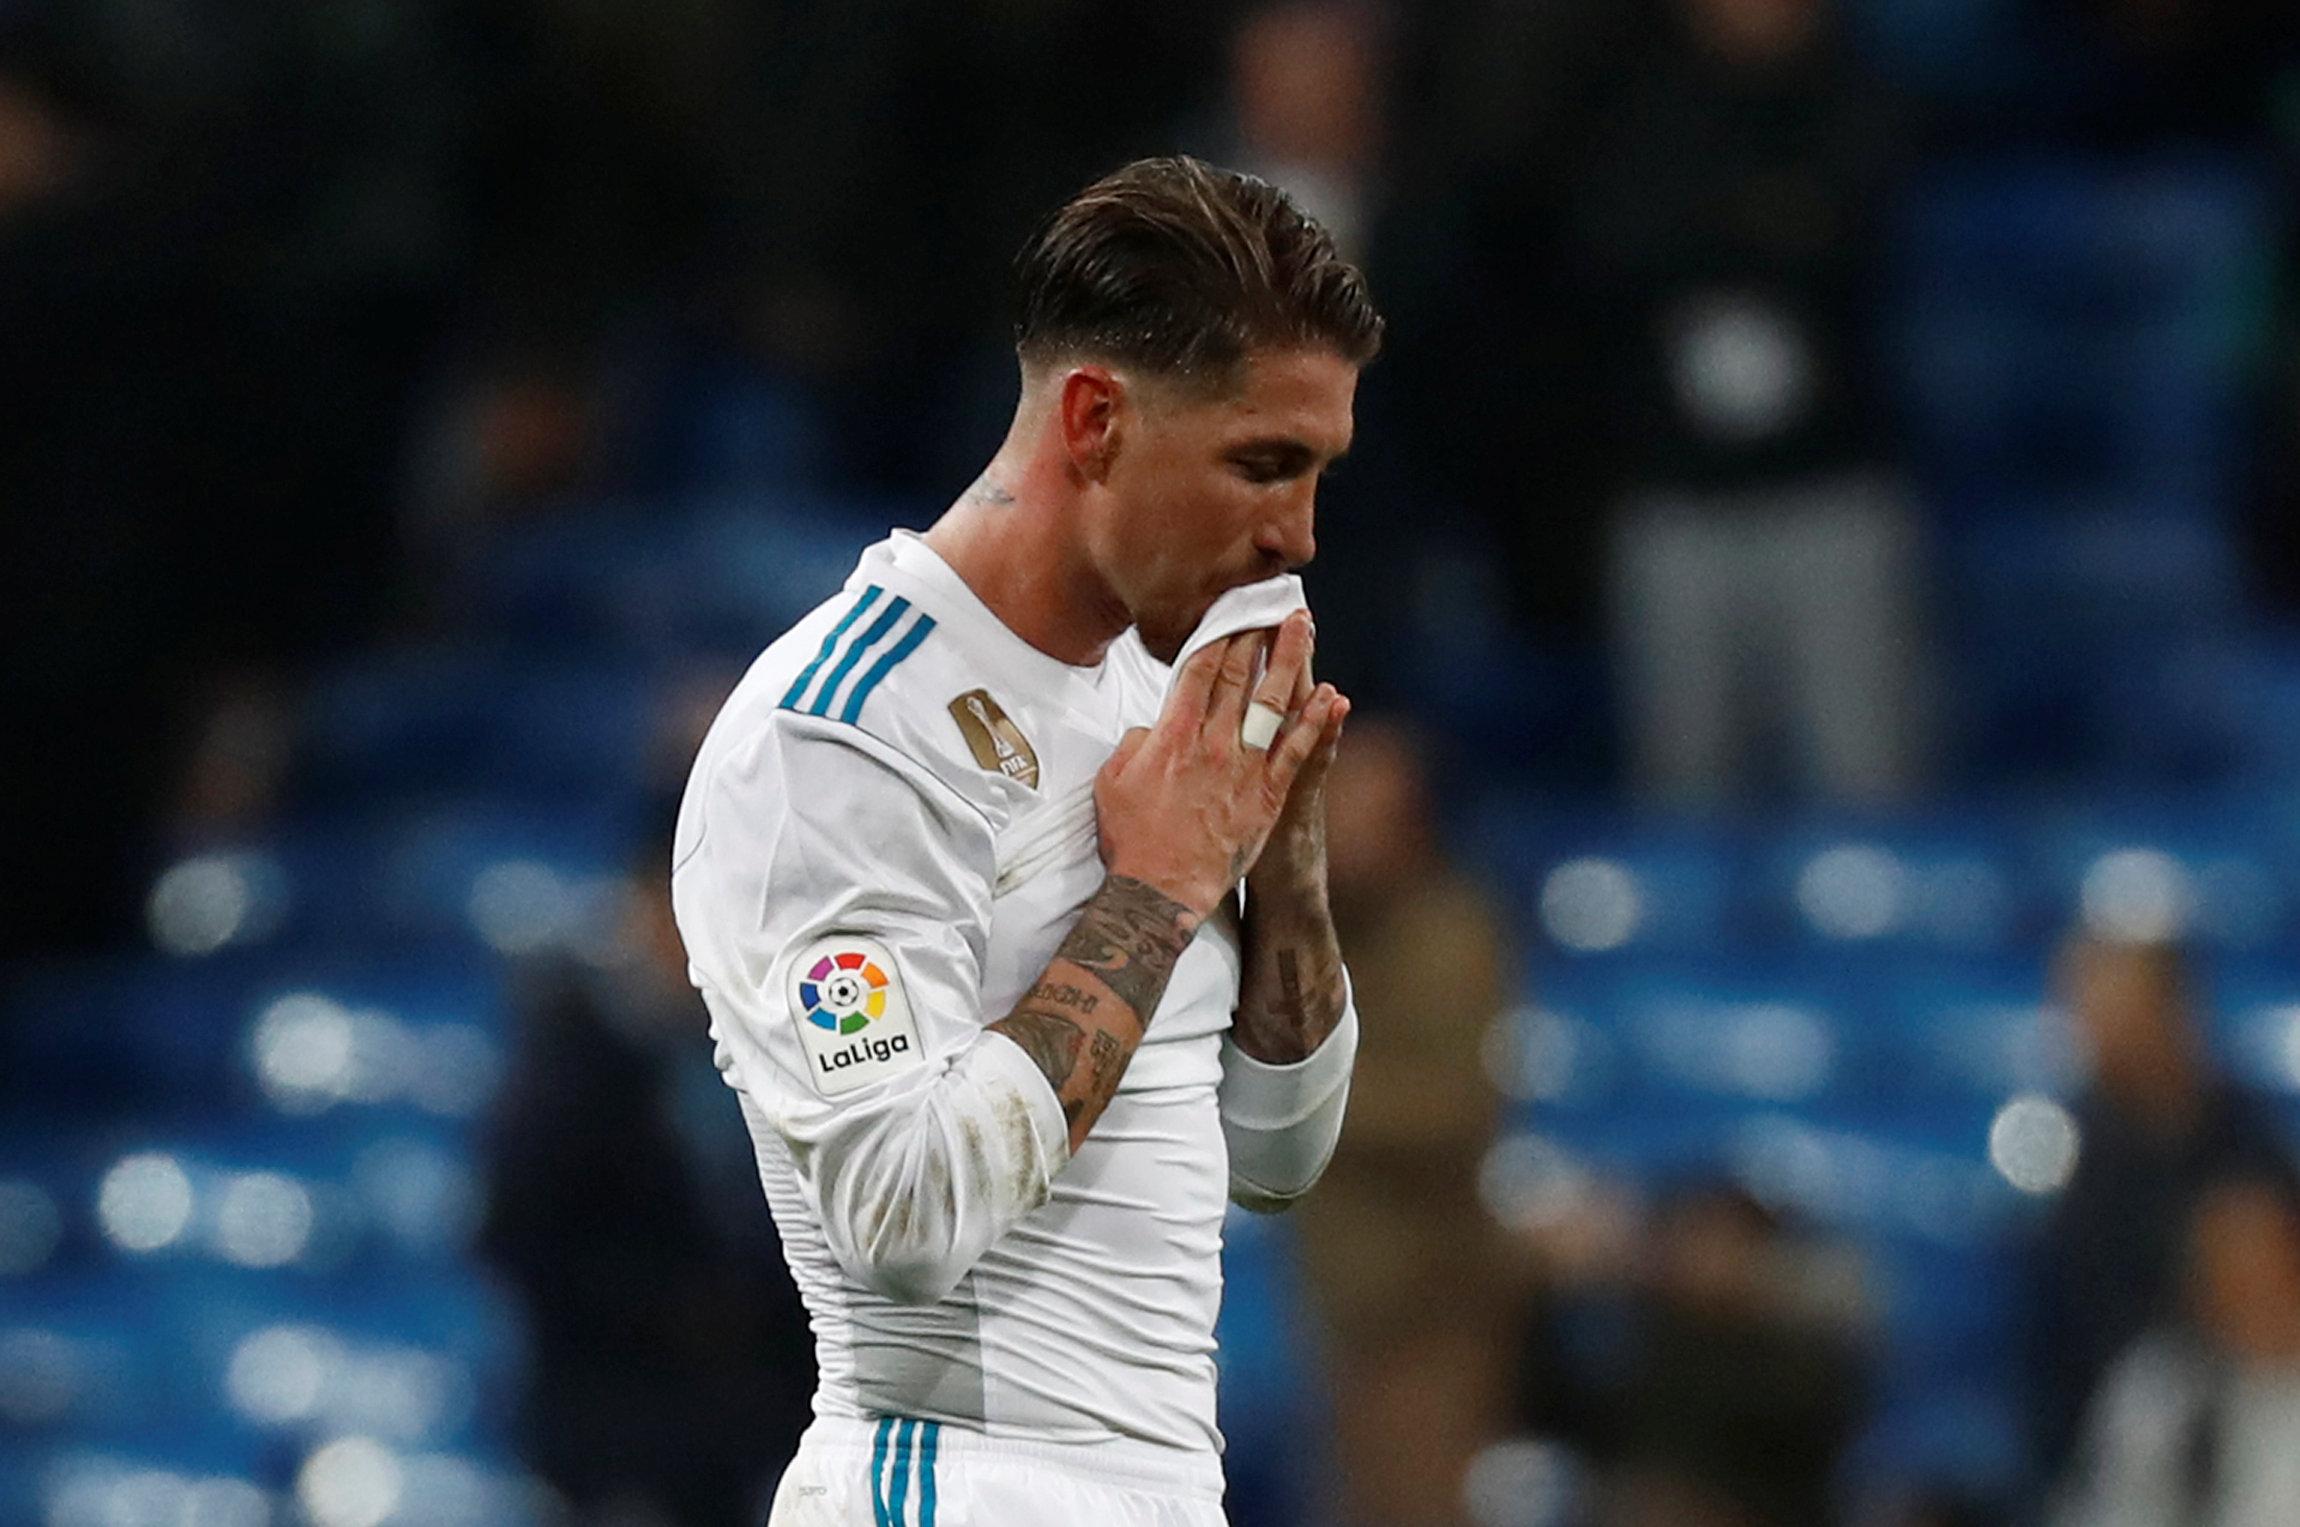 Nỗi thất vọng của Ramos sau khi R.M bị loại. Ảnh: REUTERS